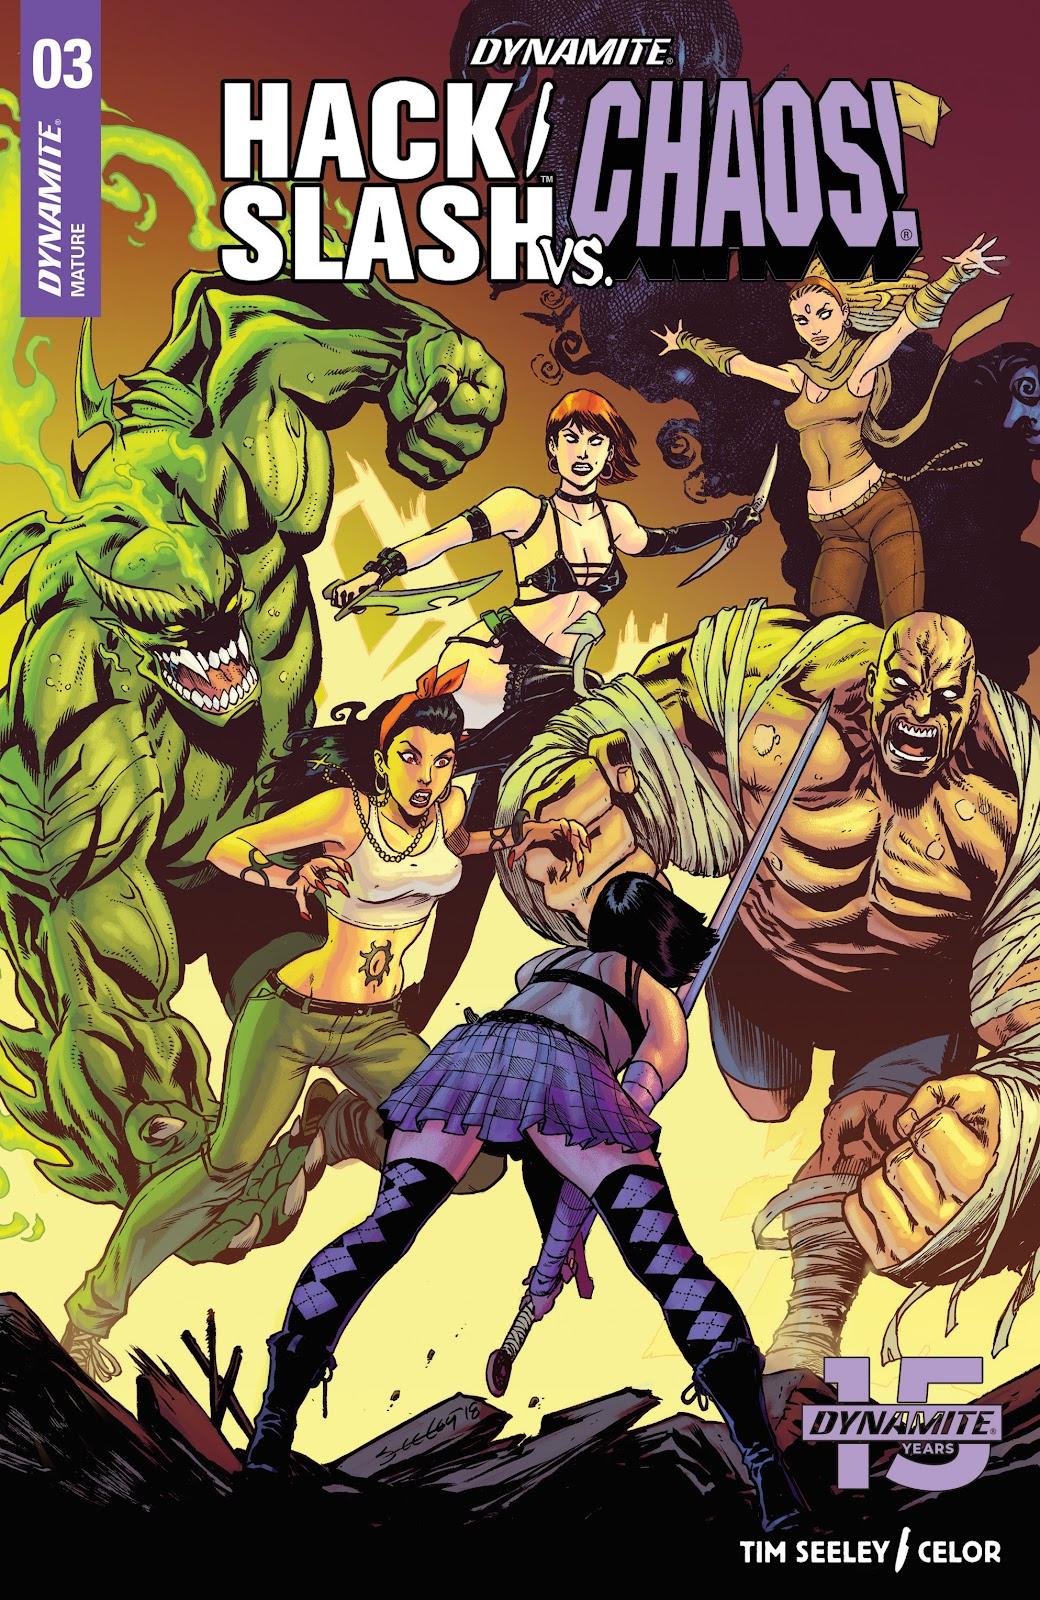 Read online Hack/Slash vs. Chaos comic -  Issue #3 - 1